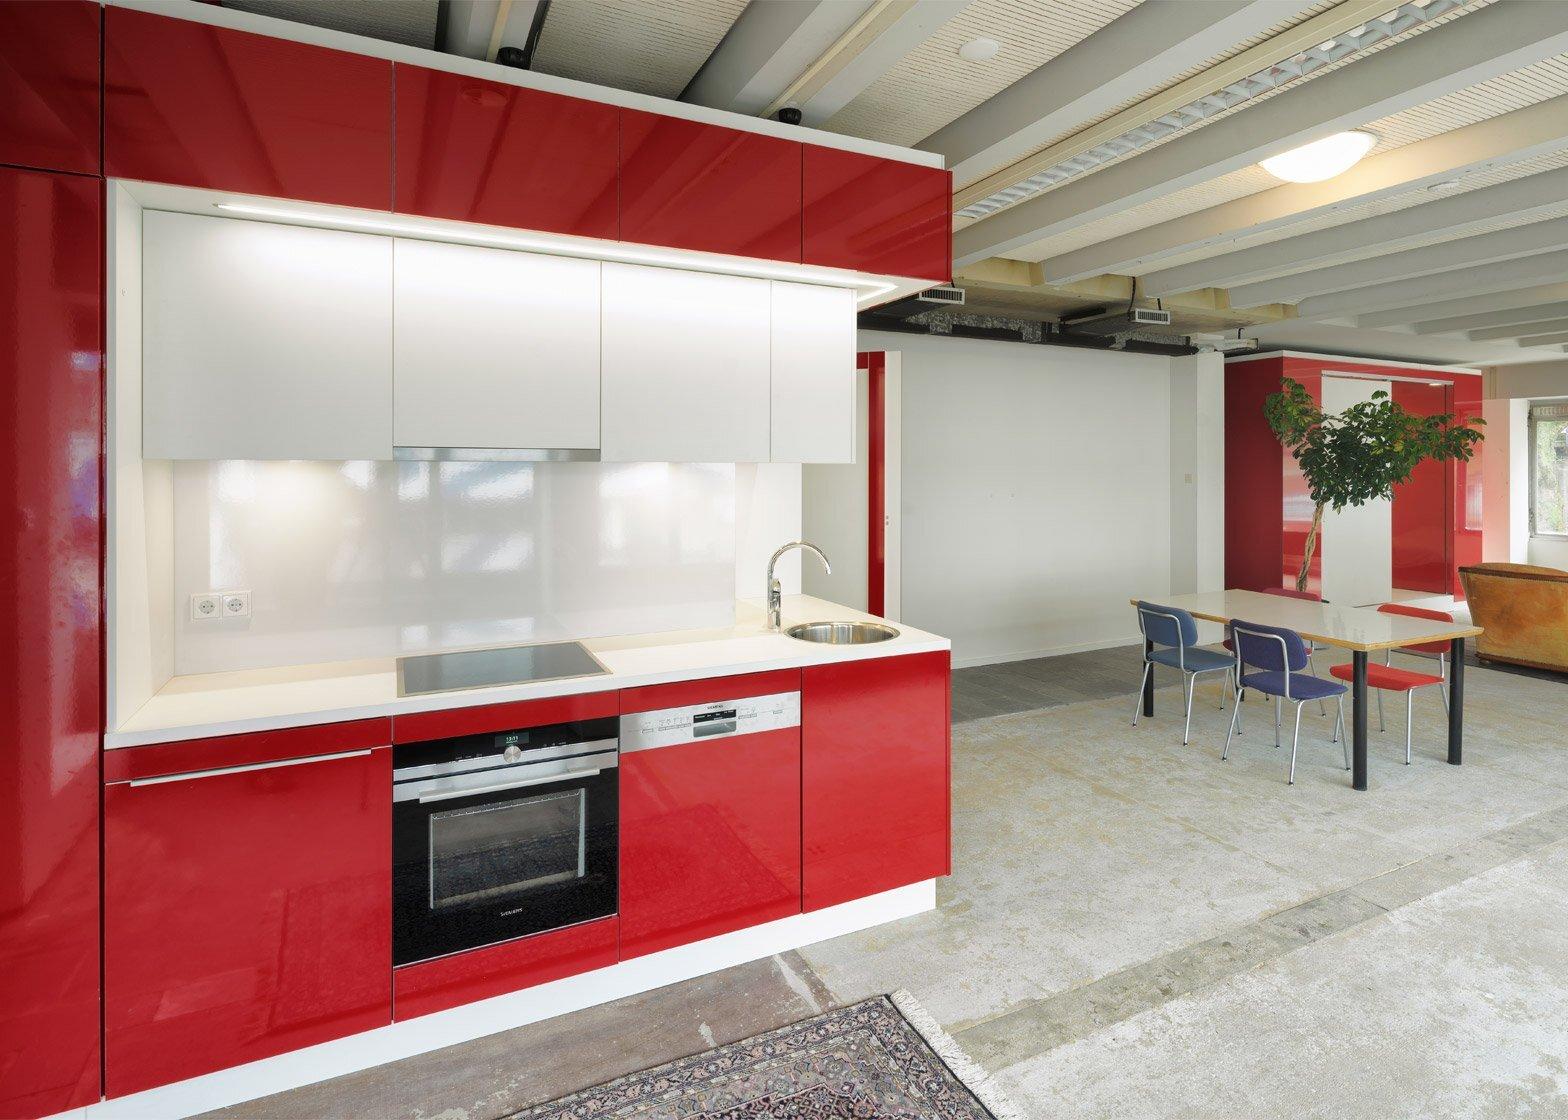 The Hub - Kraaijvanger - Rotterdam - Modular Kitchen and Bathroom 1 - Humble Homes